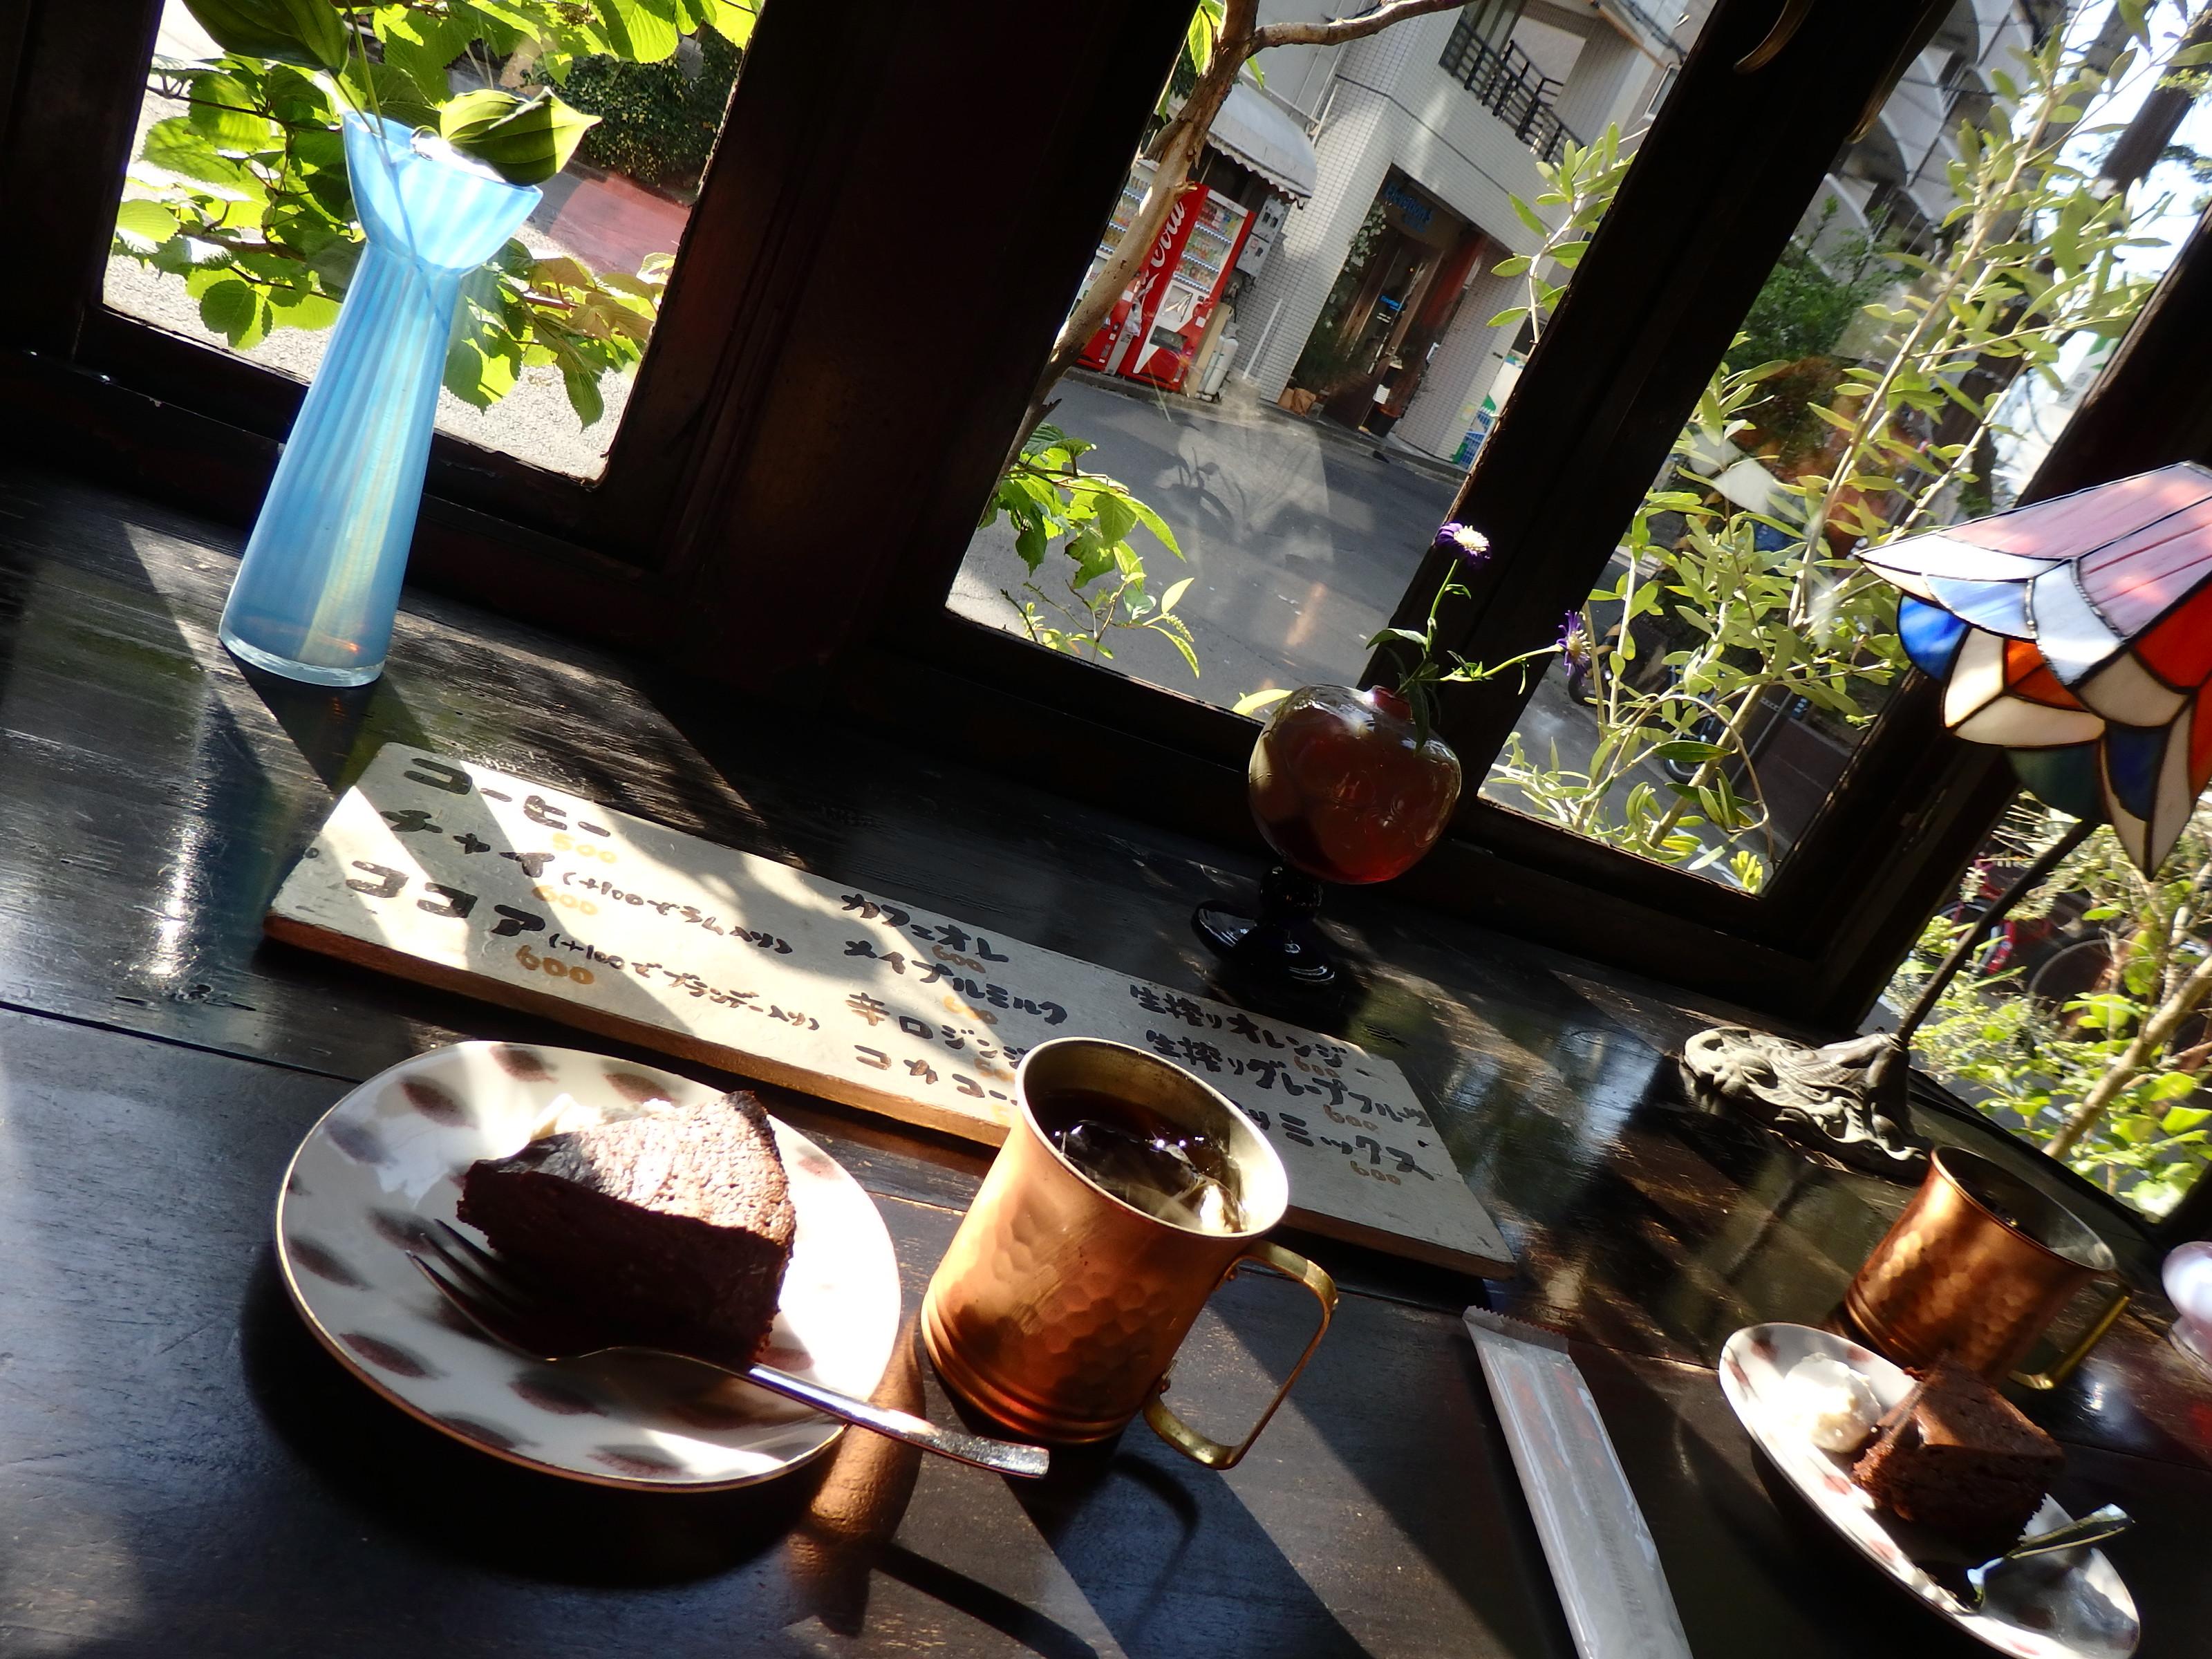 【Cafe*Vol.8】仙台街中にありながら緑あふれるゆったりカフェへ